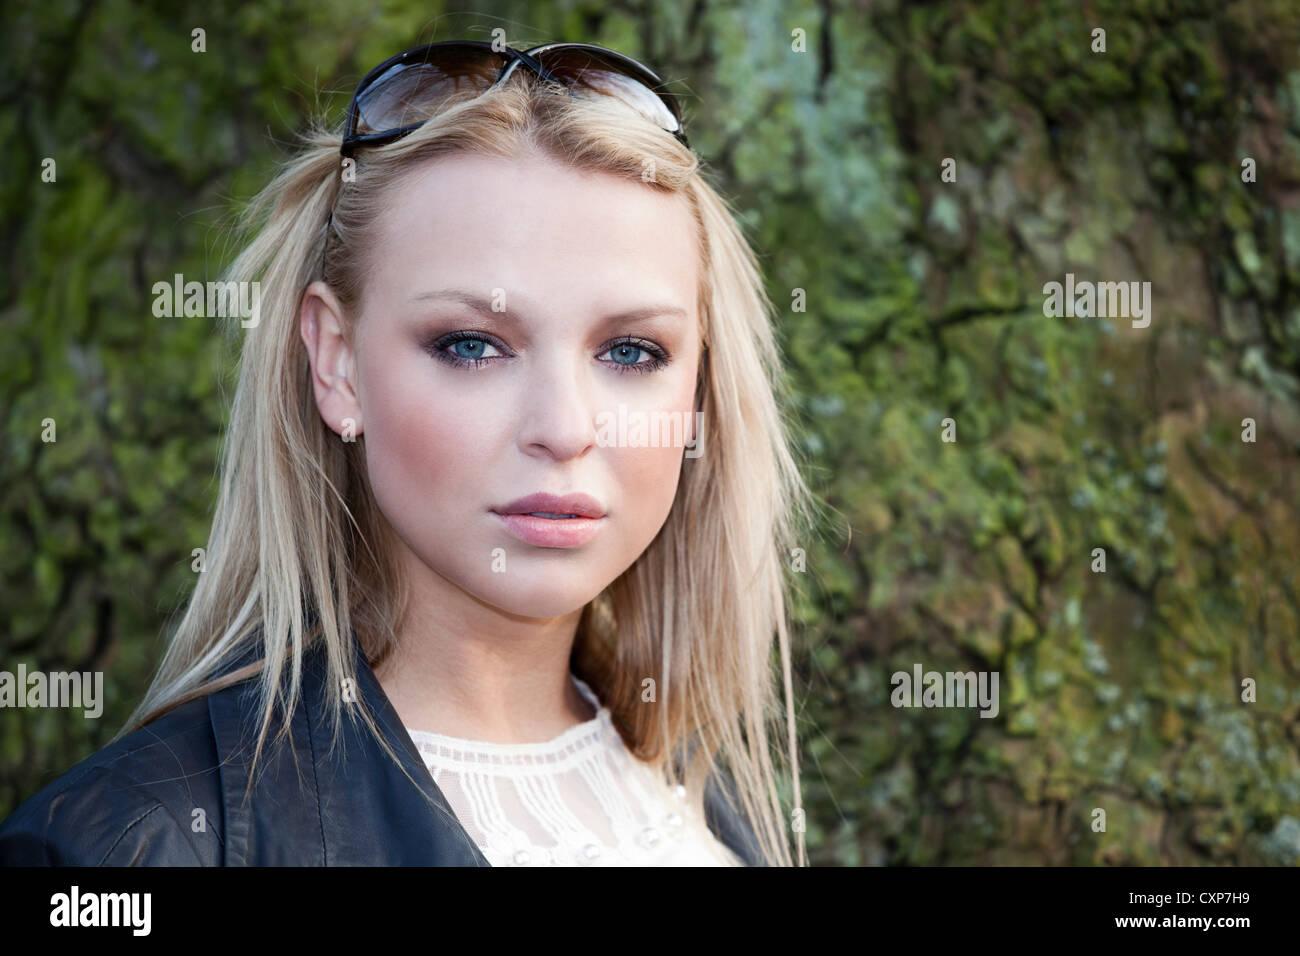 Beautiful blonde woman portrait - Stock Image